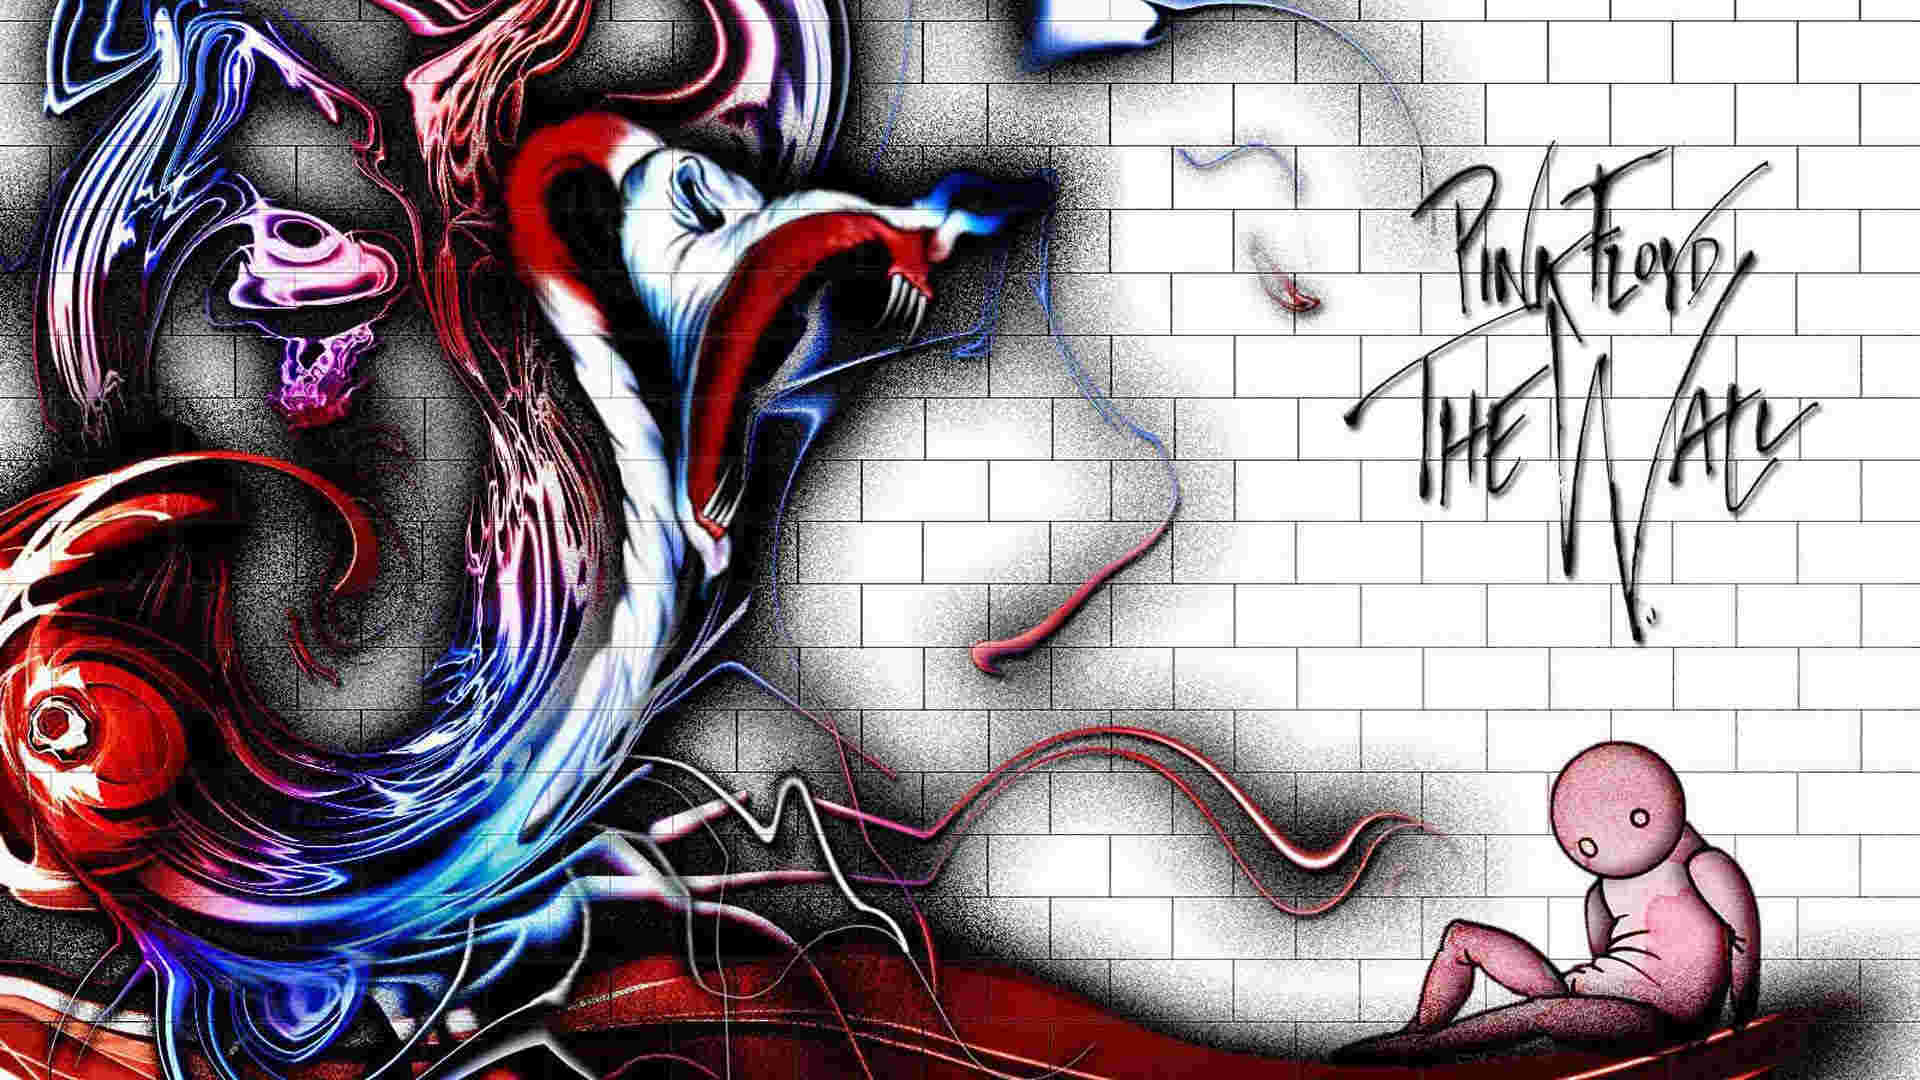 Amazing Pink Floyd Wallpaper